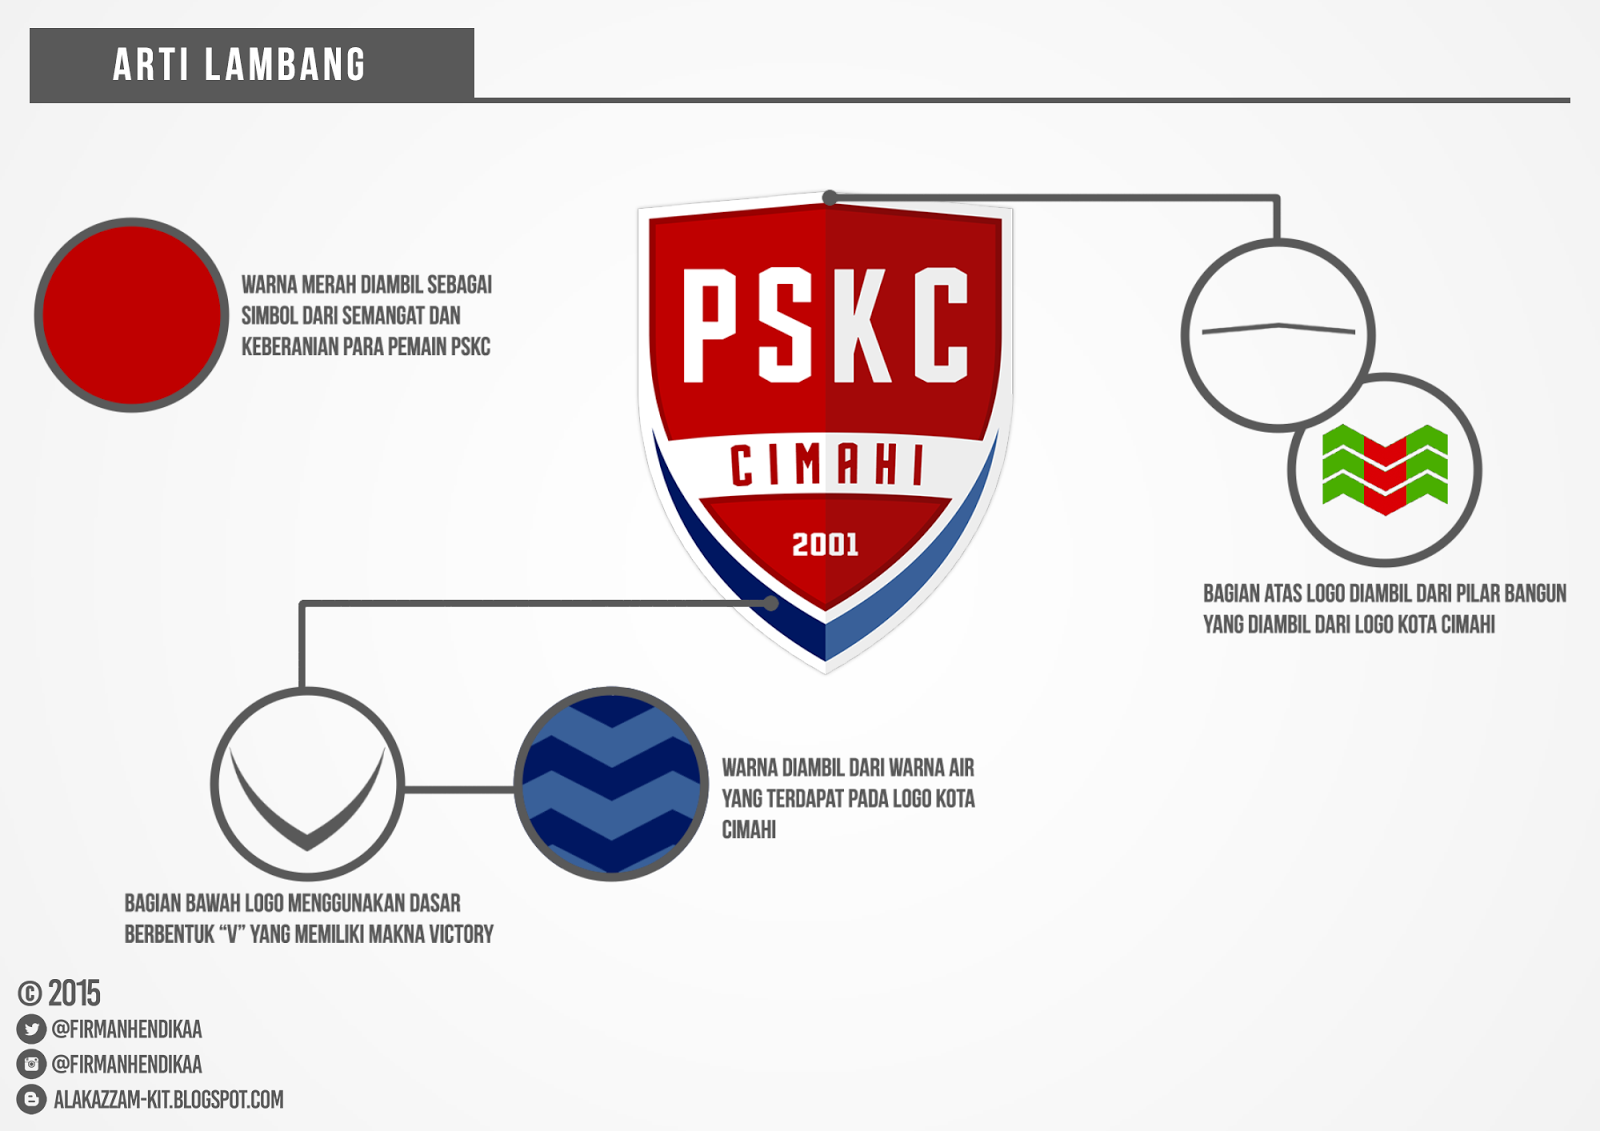 Alakazzam Kit Design Pskc Kota Cimahi Fantasy Crest Logo Design